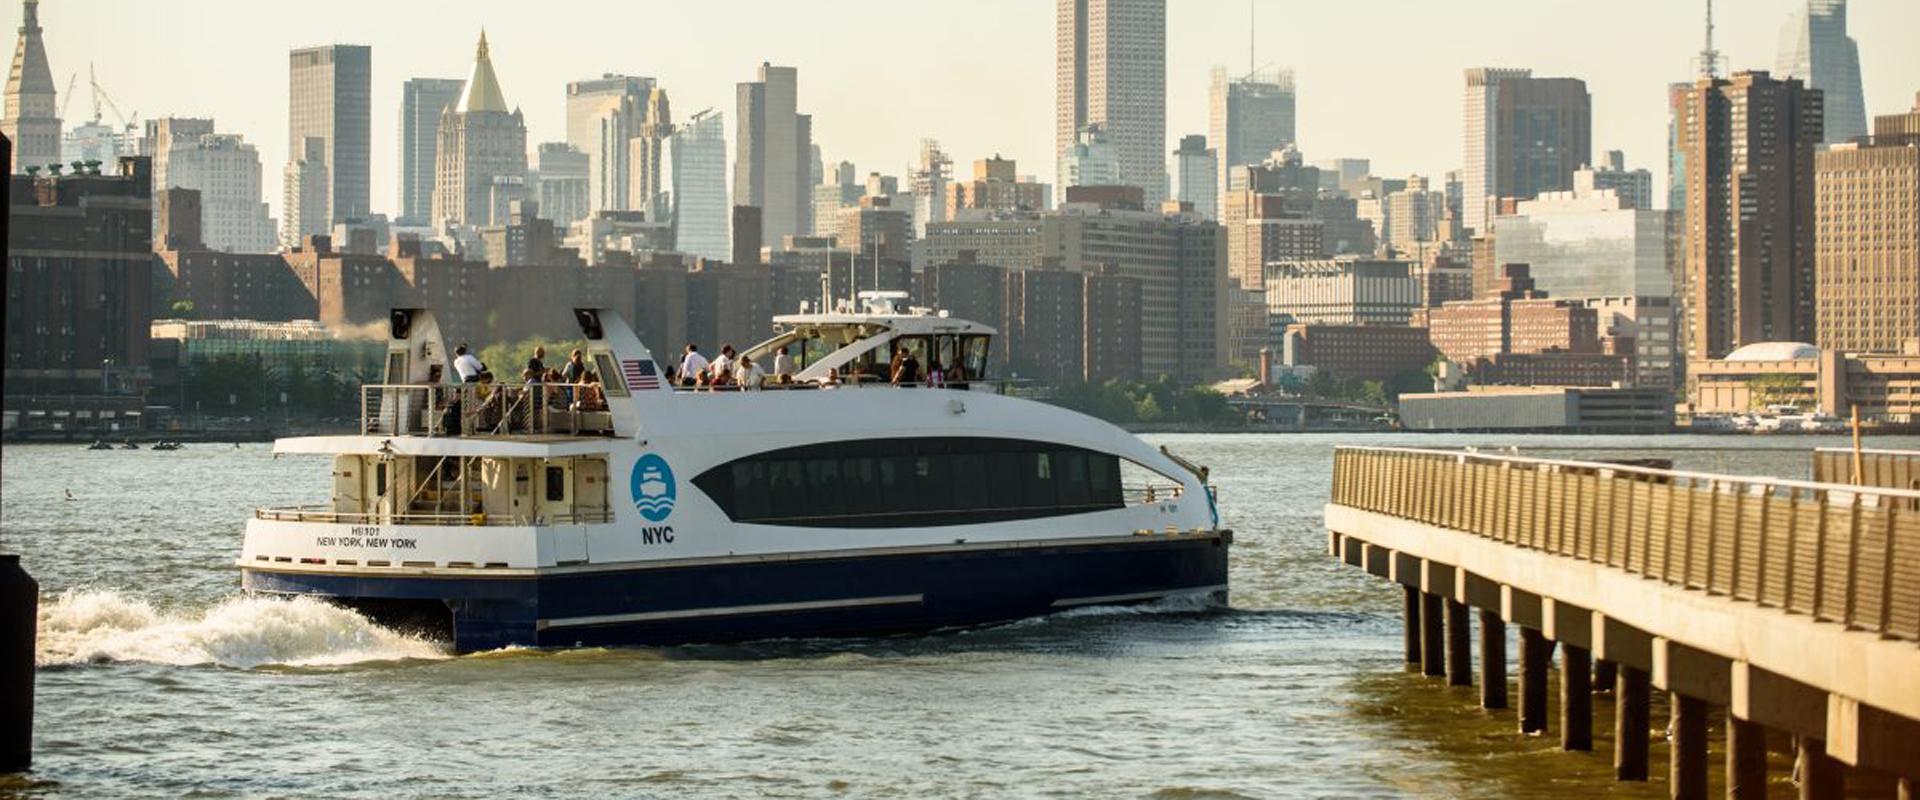 NYC Ferry - New York Transit Museum